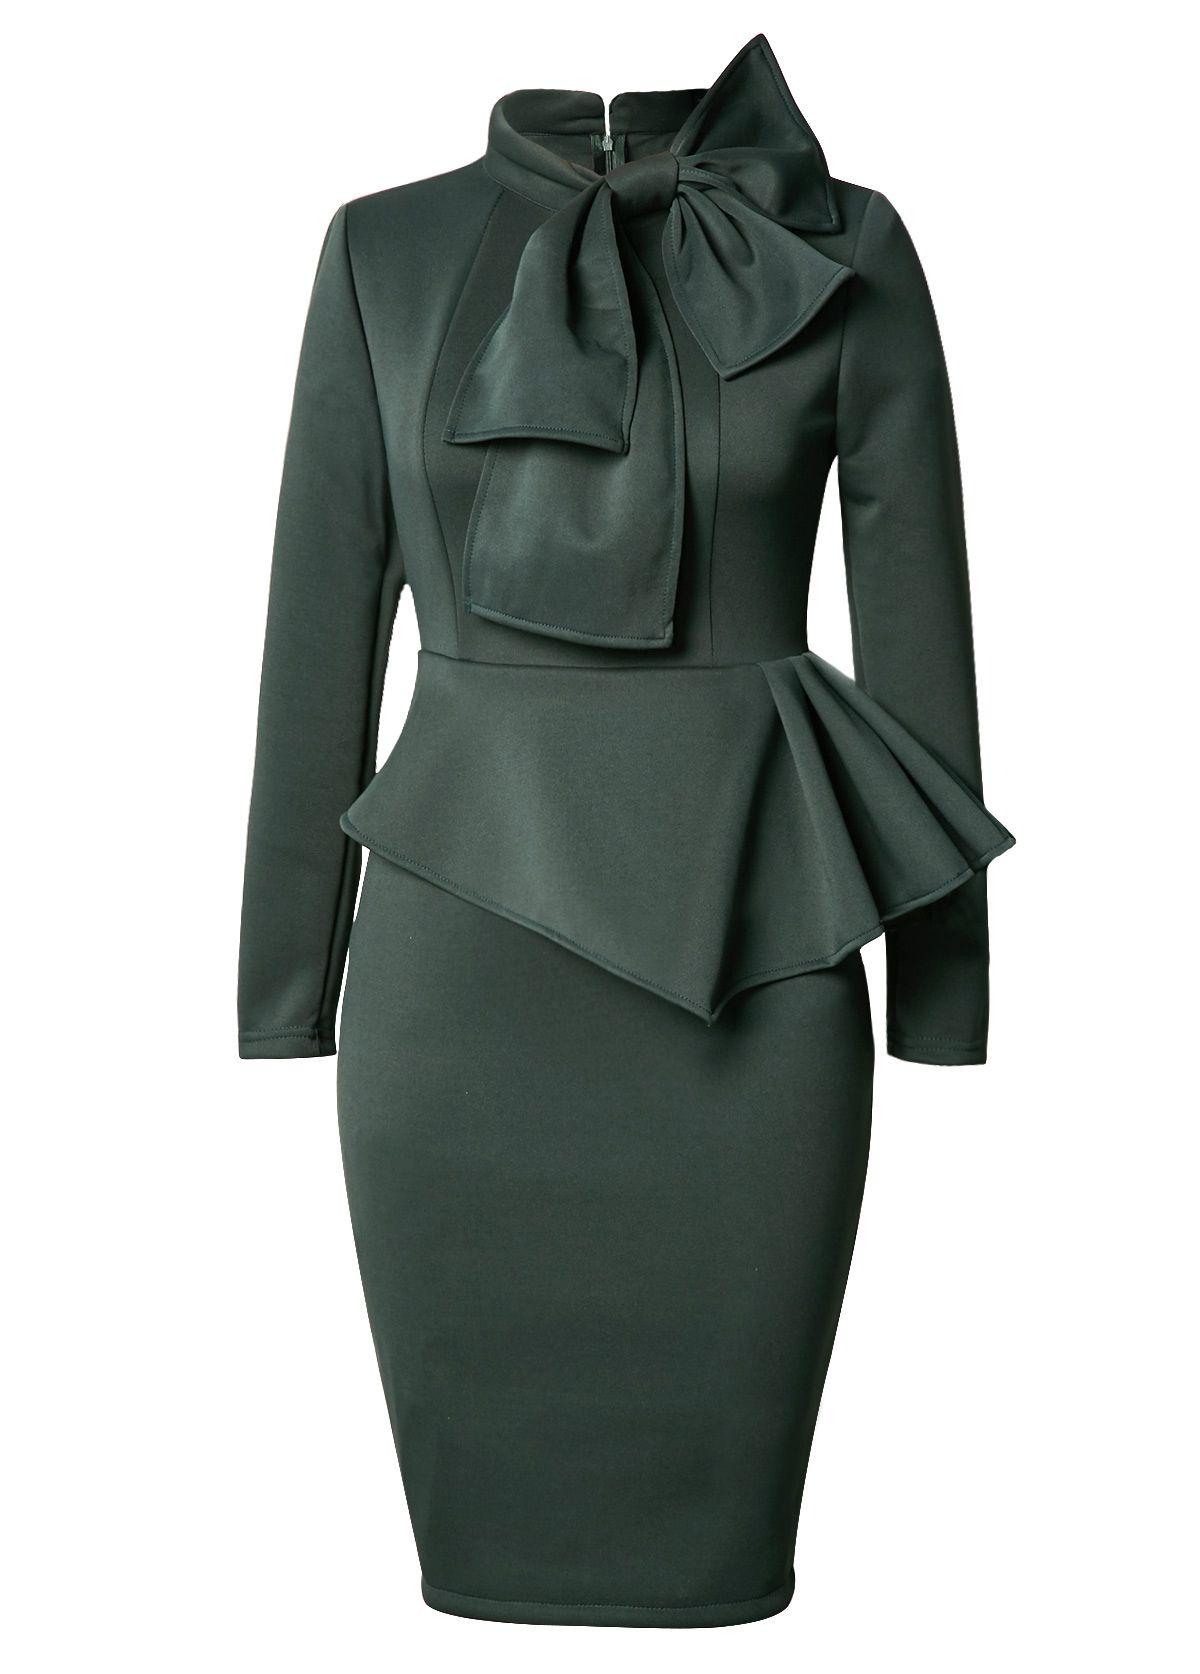 8c2959309e54 Long Sleeve Bowknot Embellished Peplum Waist Dress on sale only US$34.42  now, buy cheap Long Sleeve Bowknot Embellished Peplum Waist Dress at  lulugal.com